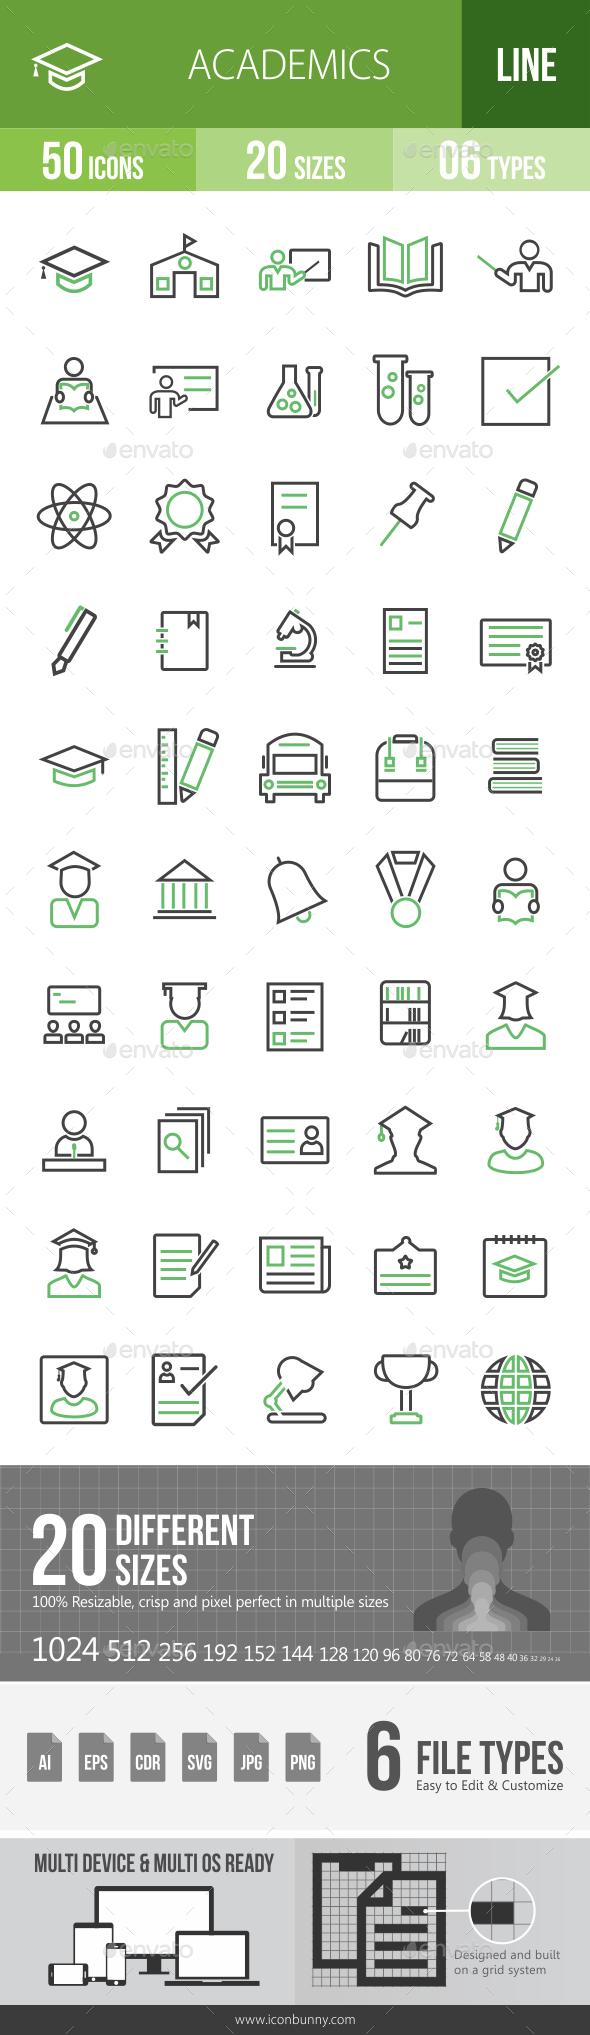 GraphicRiver 50 Academics Green & Balck Line Icons 21186752